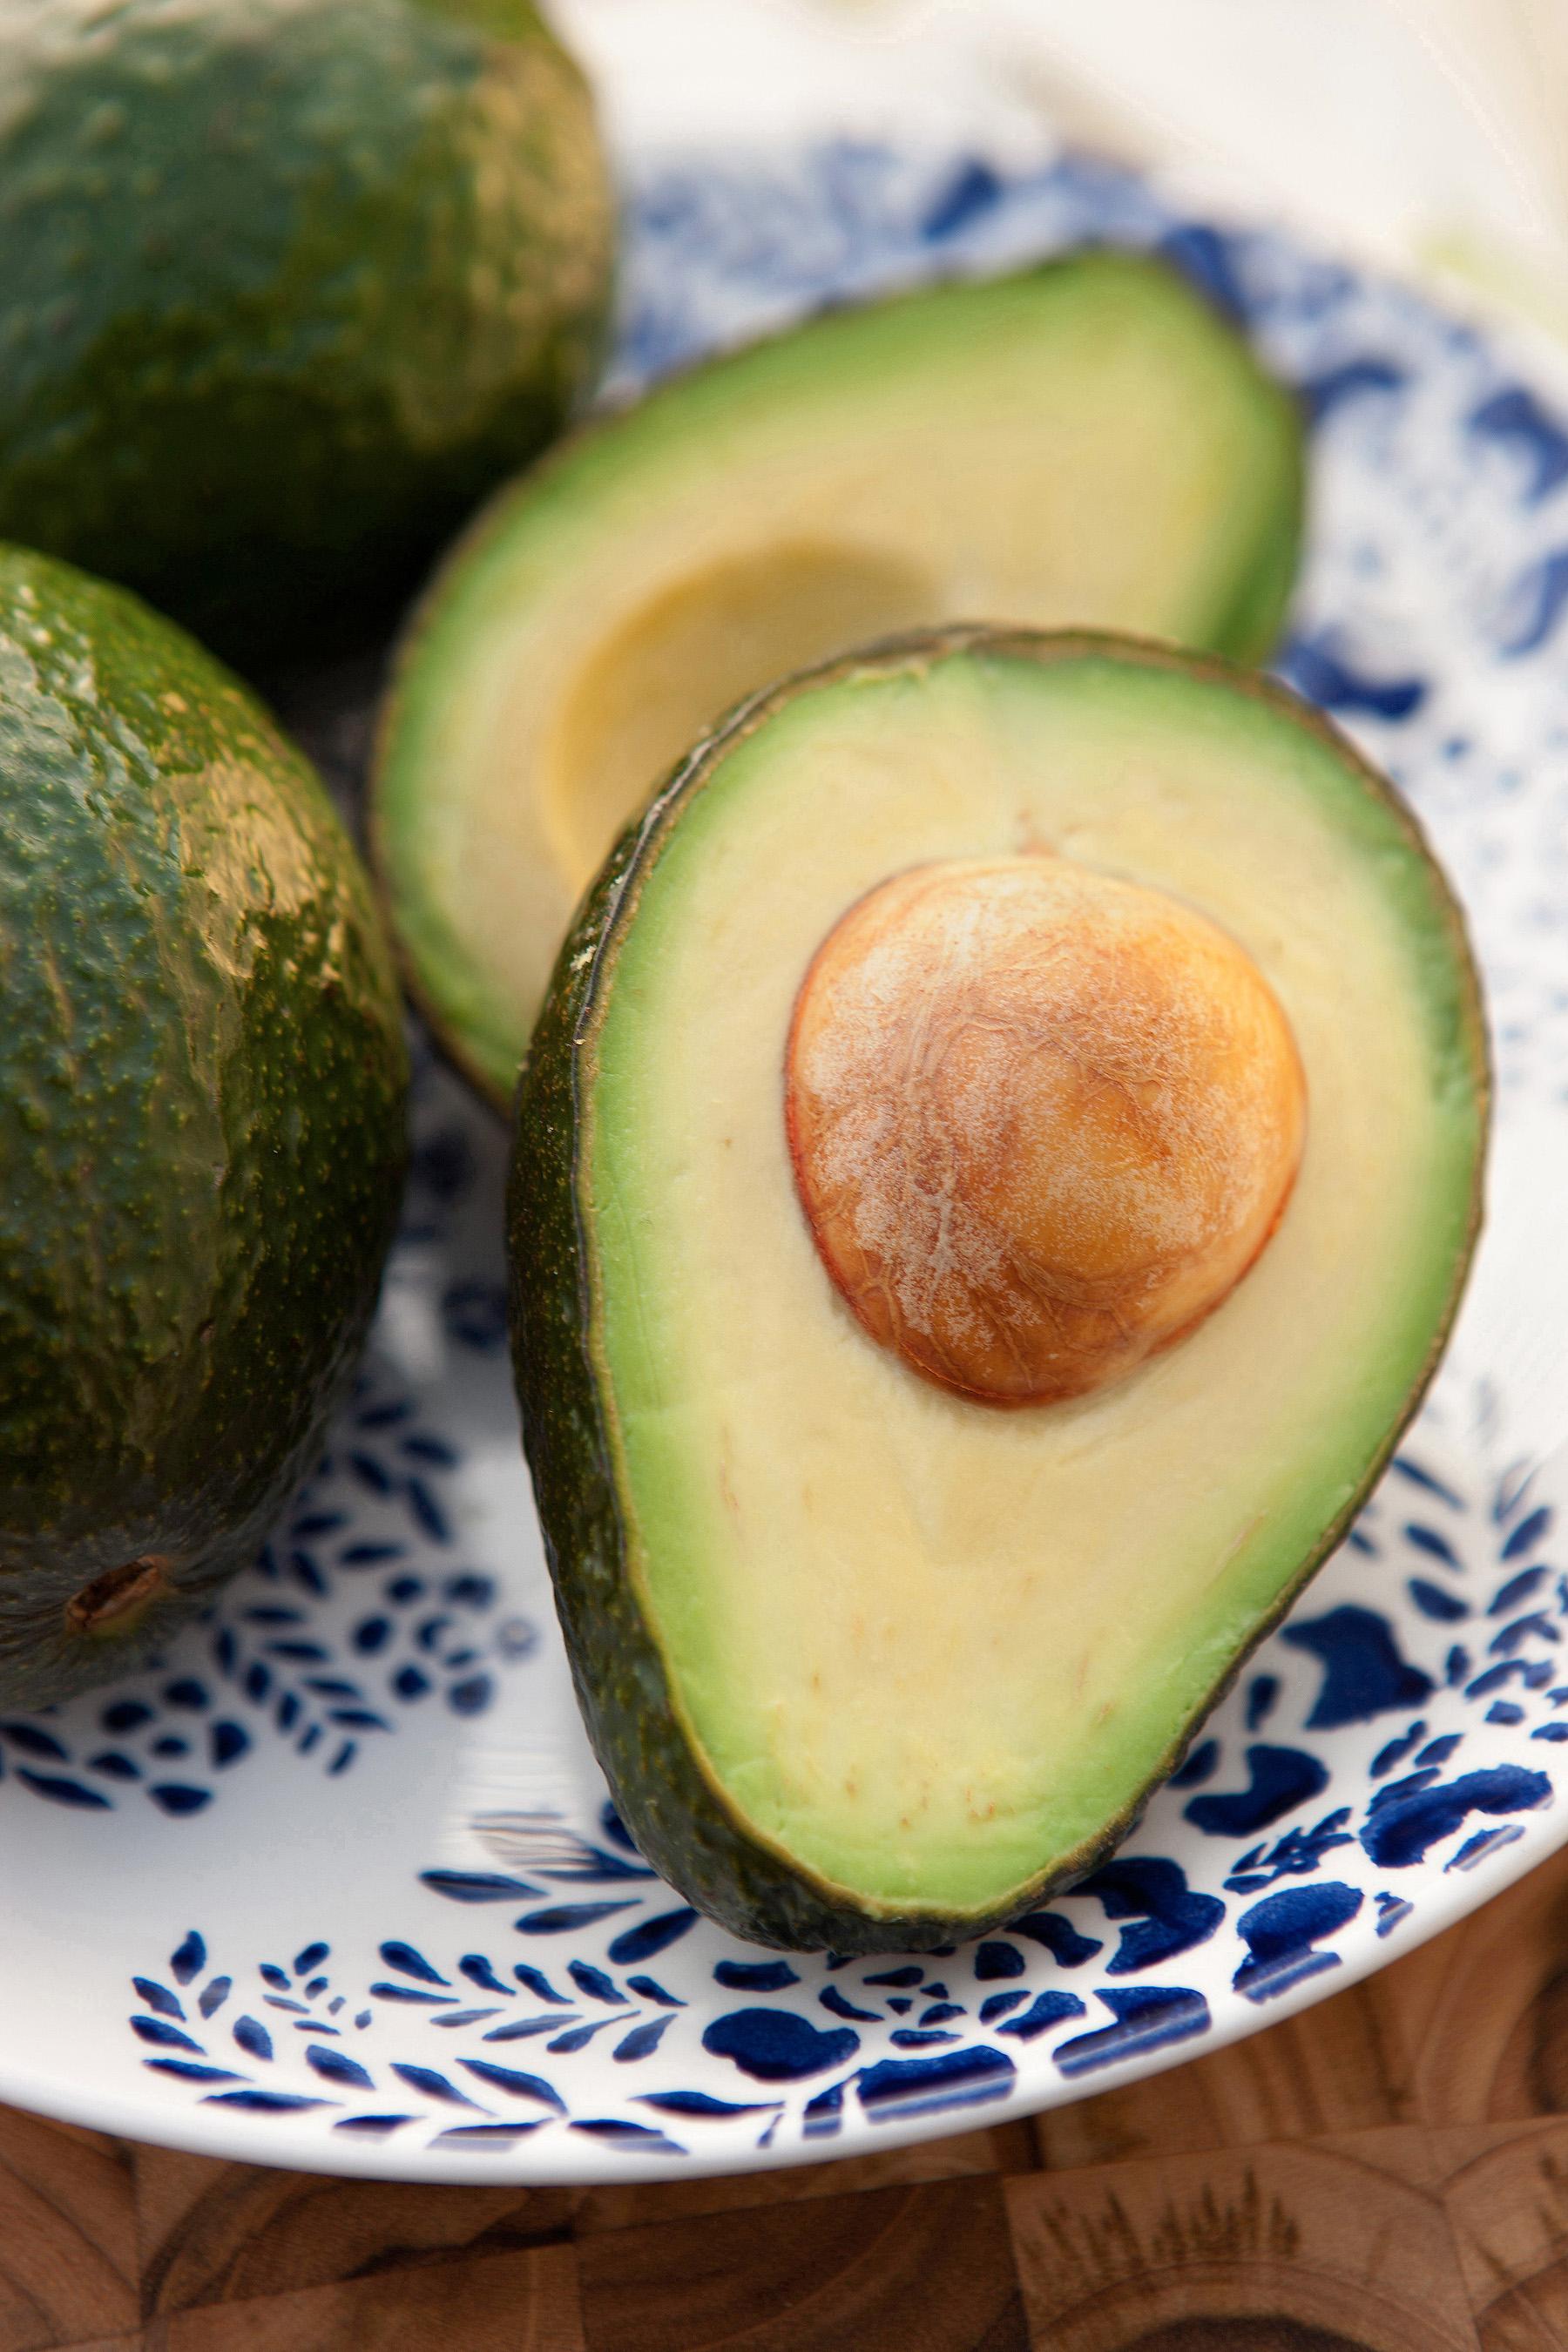 Are avocado pits edible?